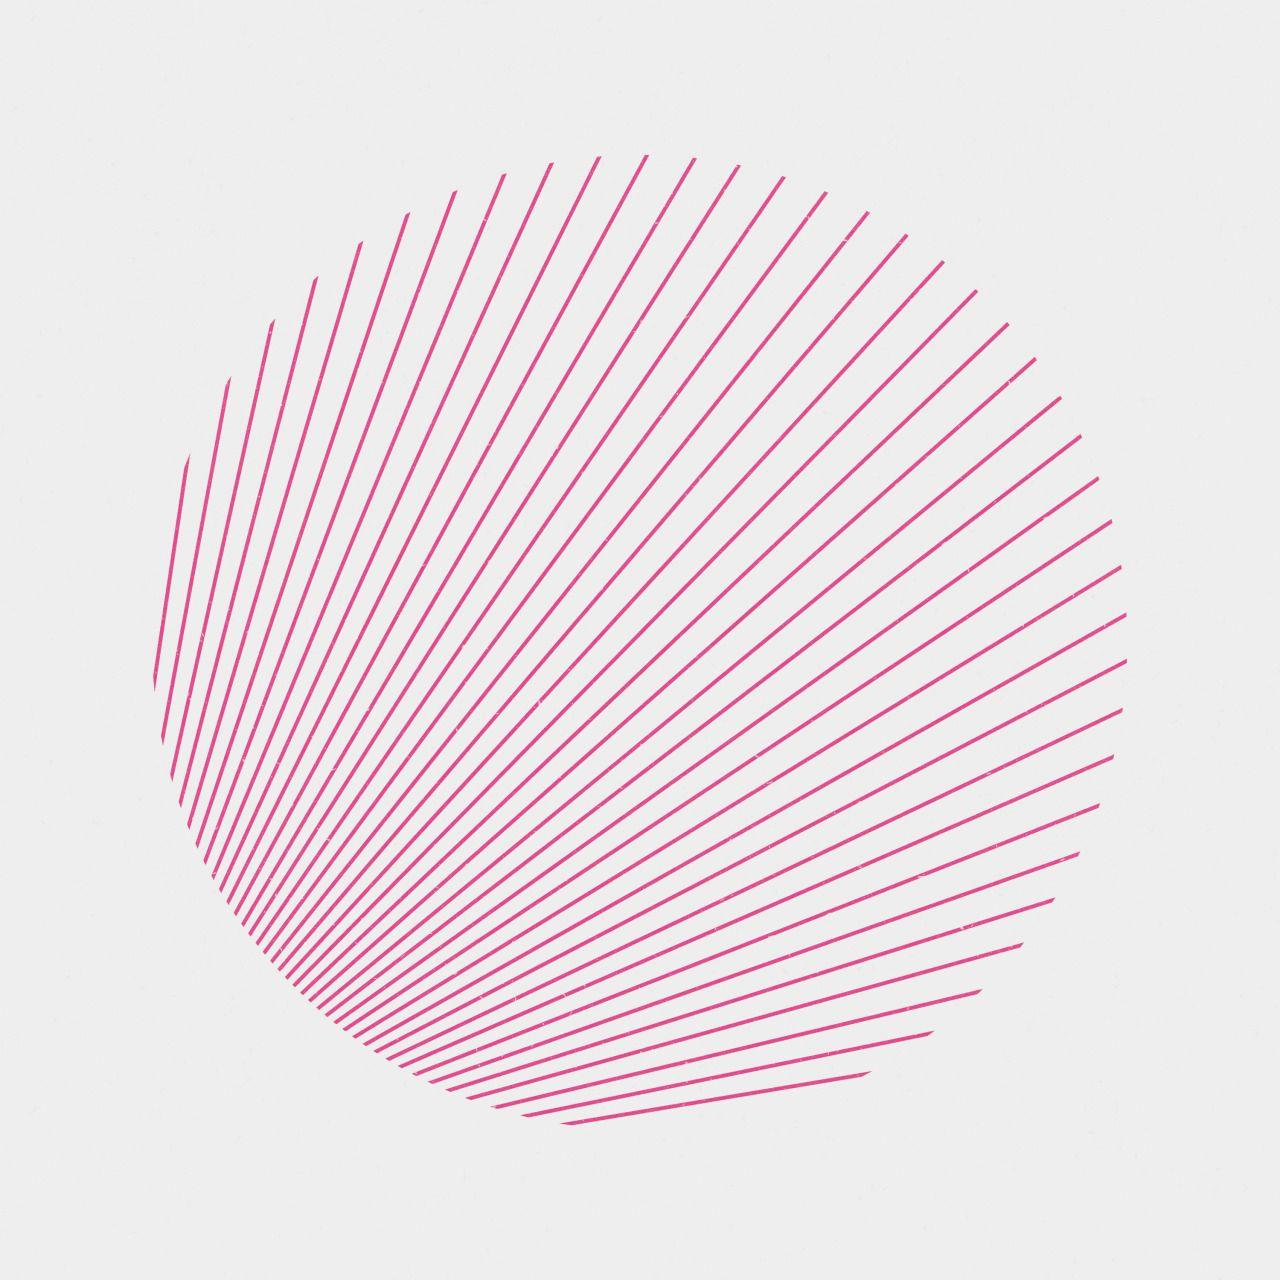 #DE14-051 A New Geometric Design Every Day.